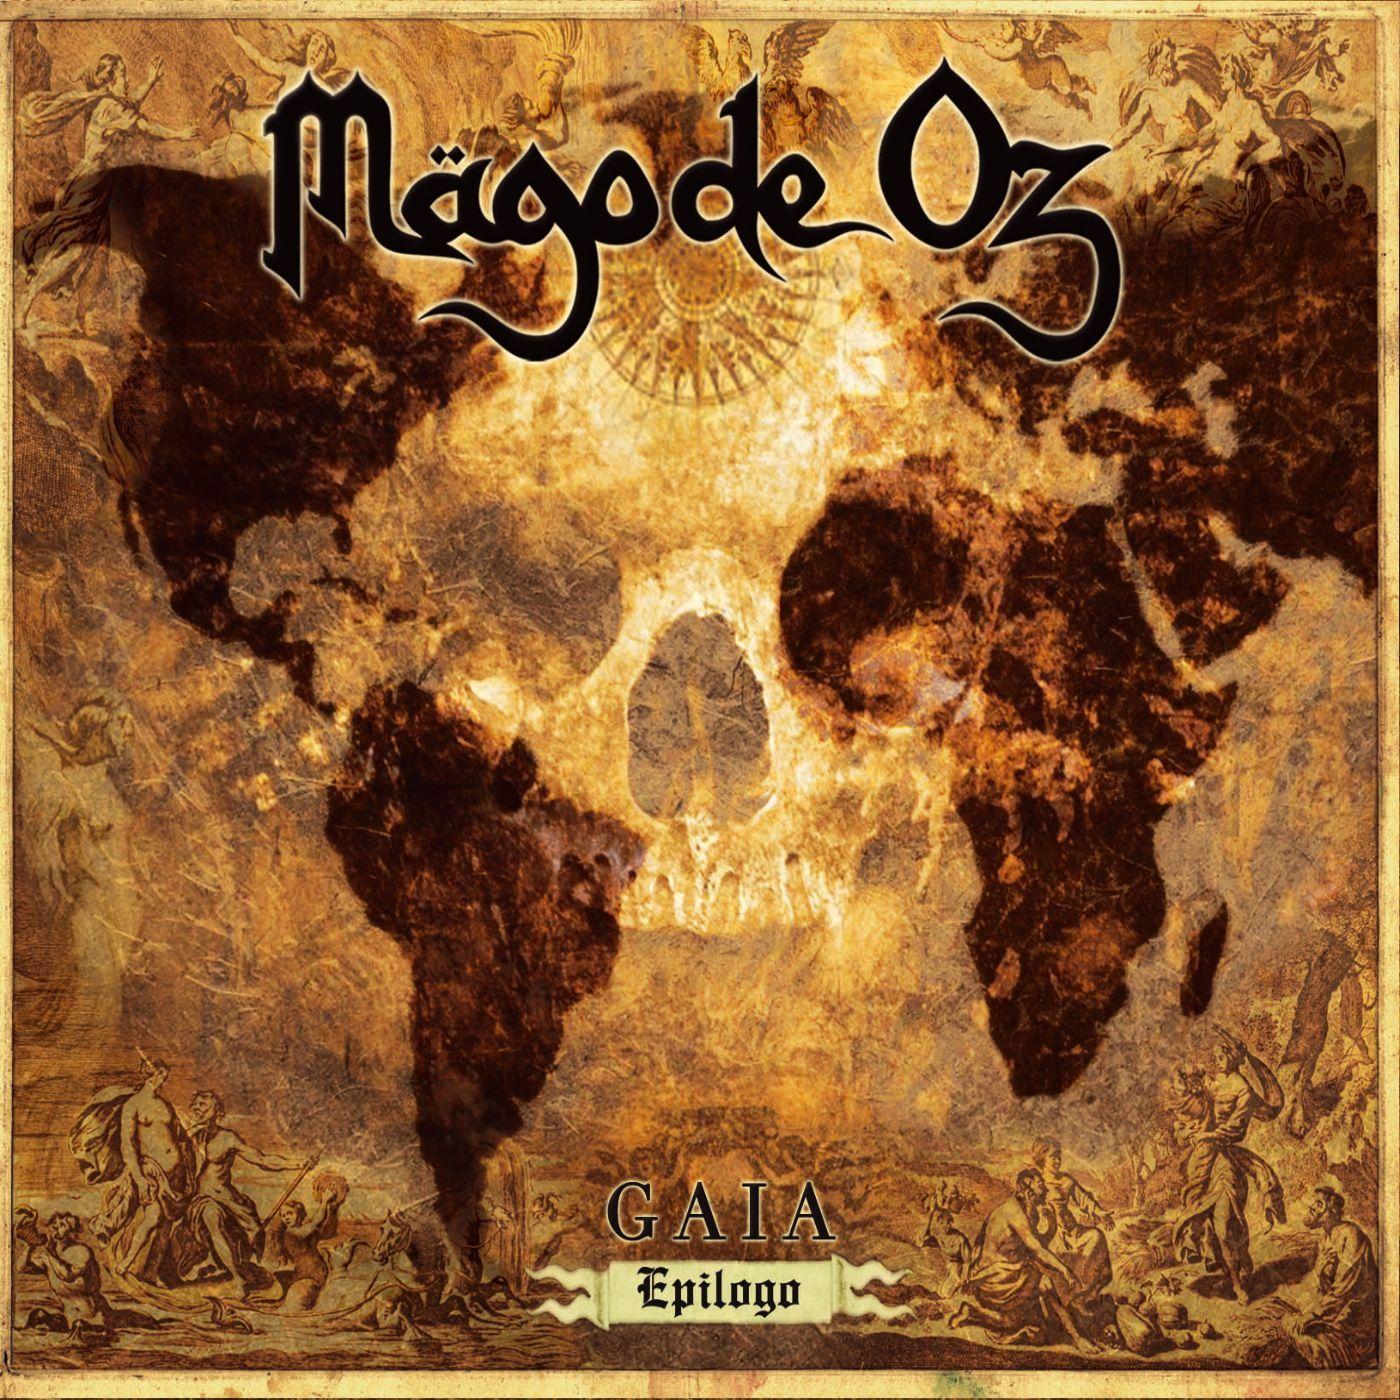 Mägo De Oz - Gaia - Epilogo album cover